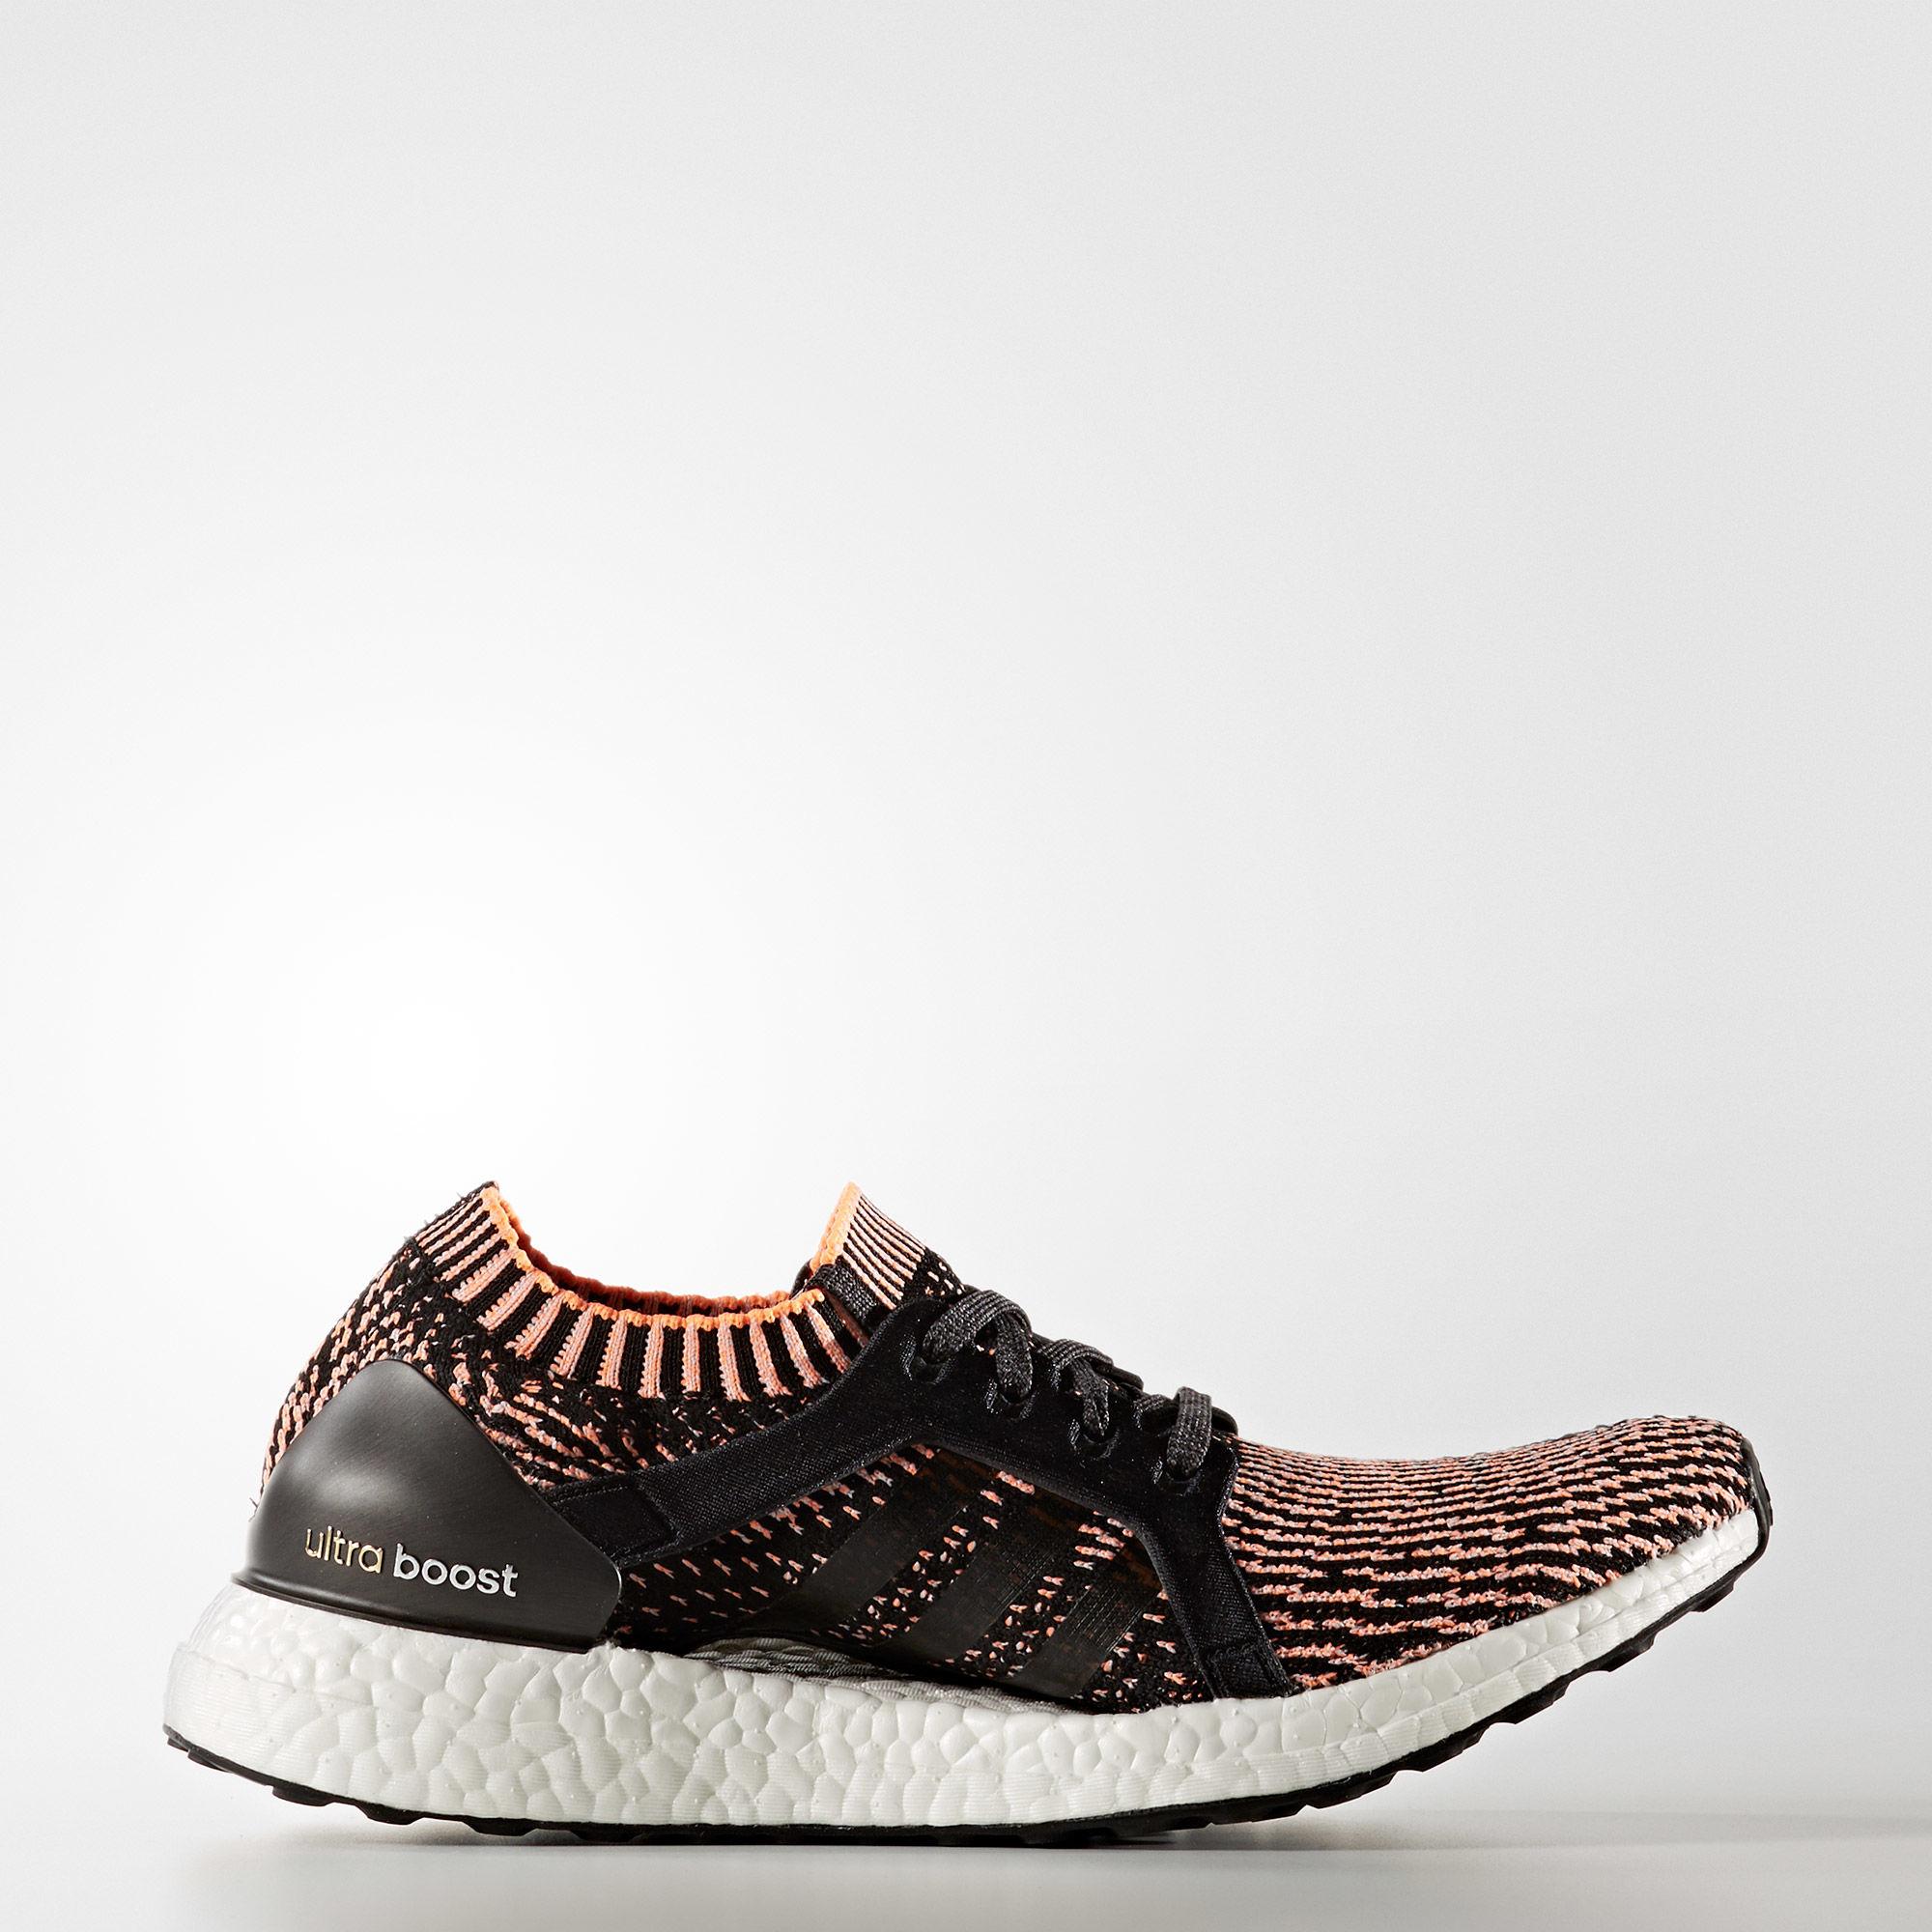 grande vente 17430 857bf Adidas Revenge mesh boost - chaussure de running pour ...